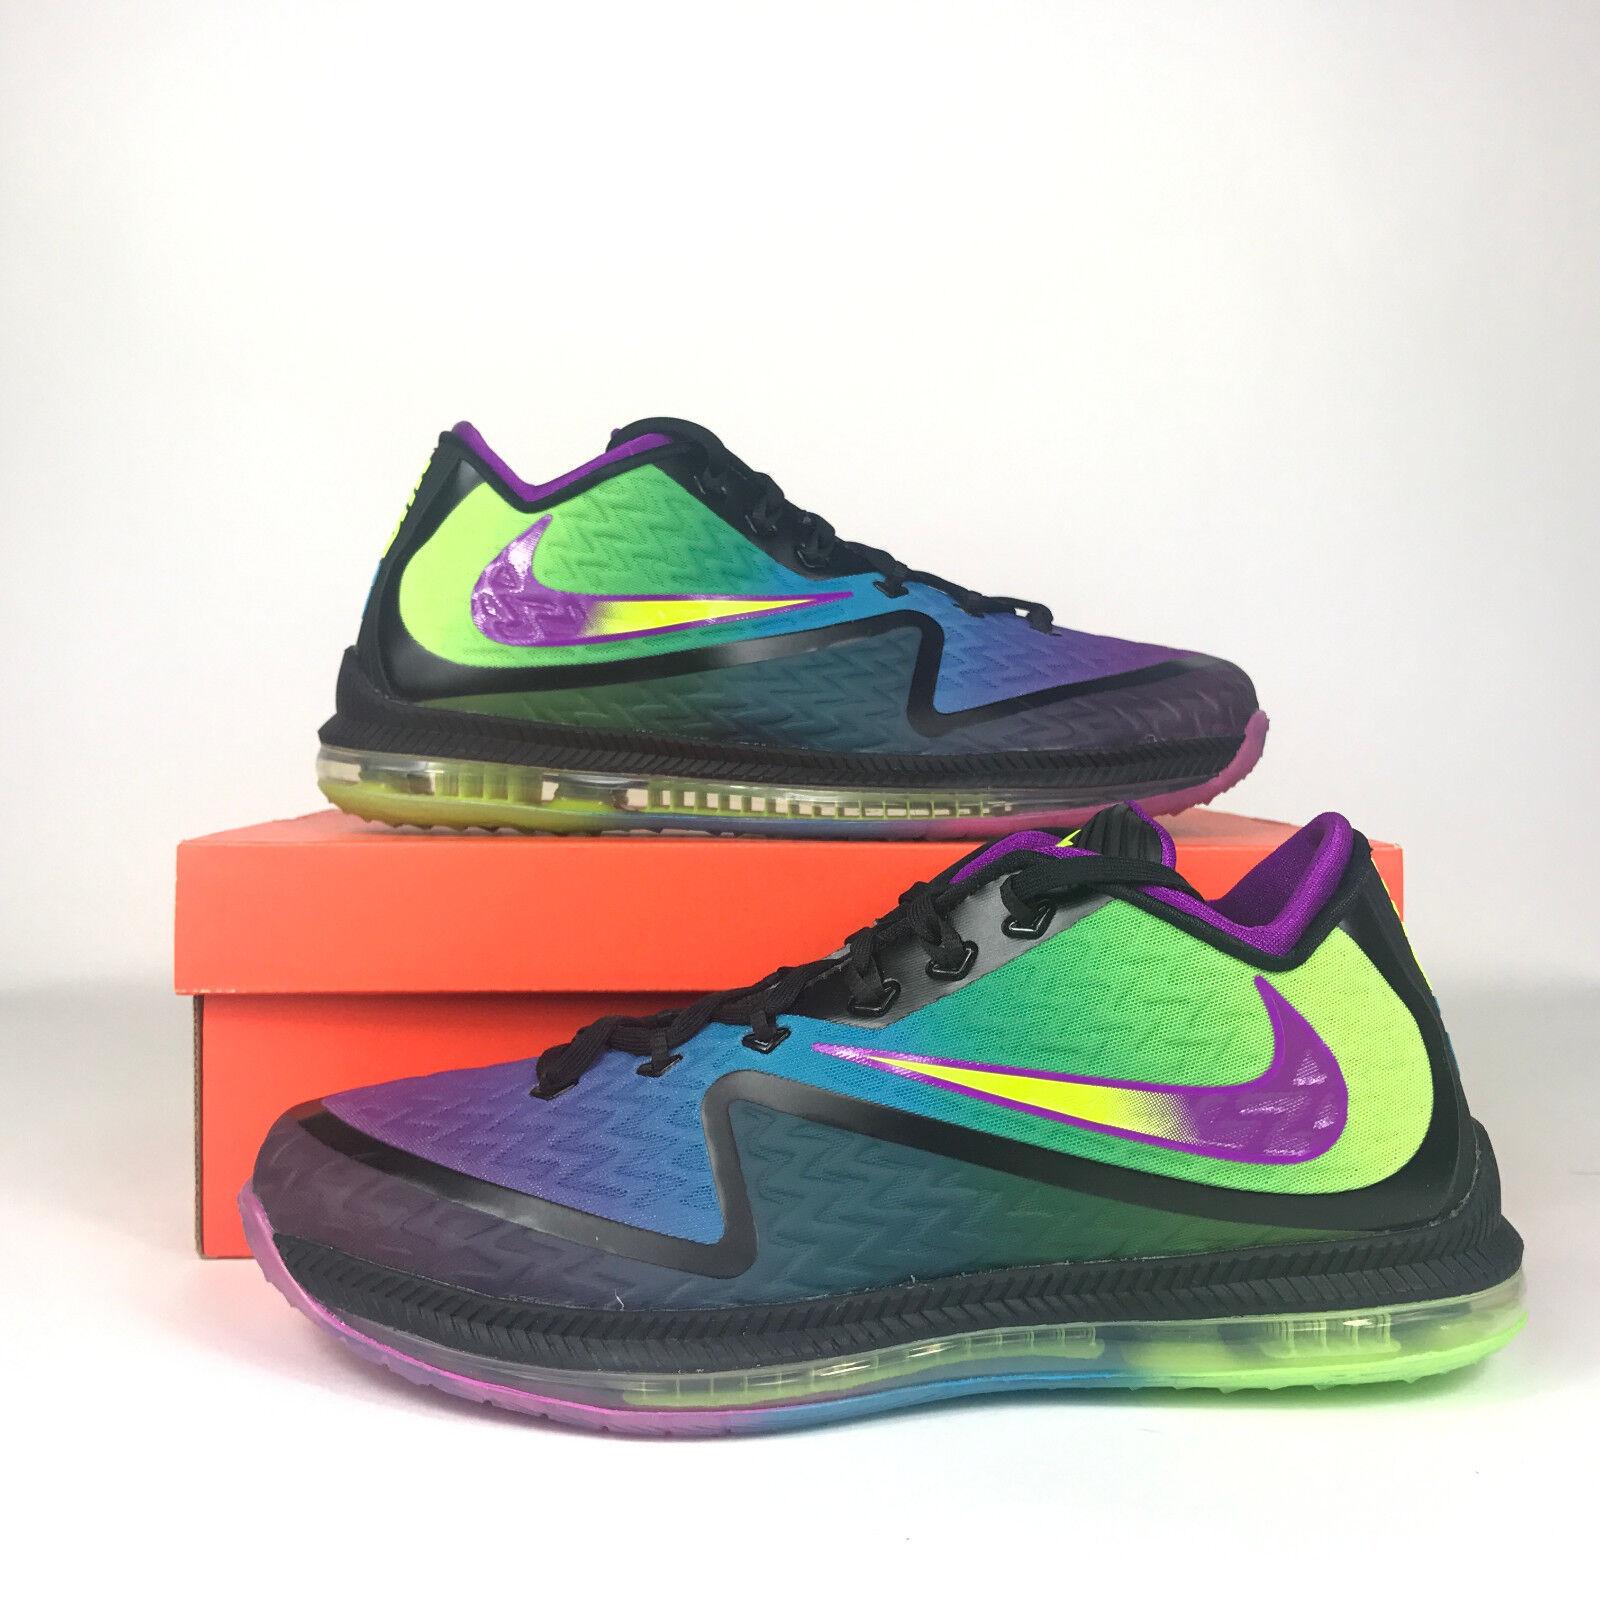 Nike Field General 2 Black Vivid Purple Volt bluee Lagoon Mens 749310 057 mult sz